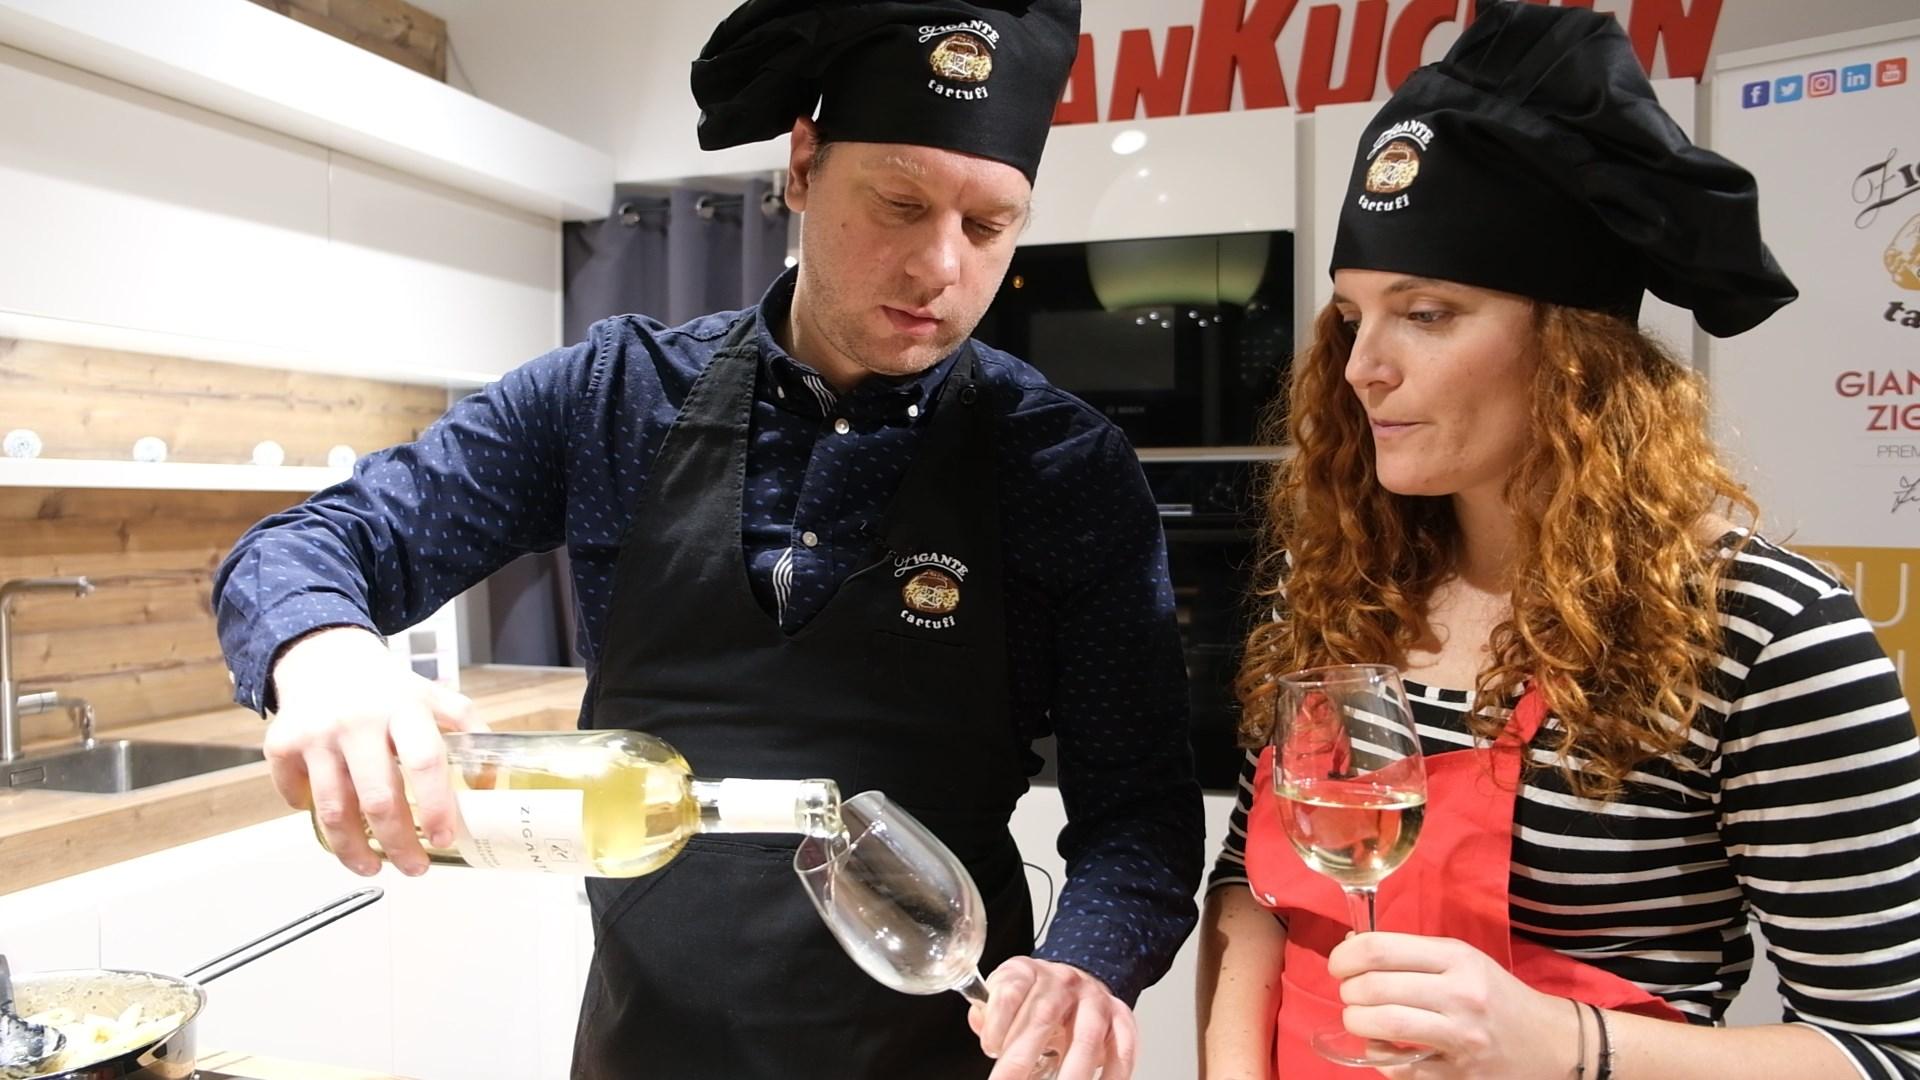 Extravagant chef: Fuži s tartufatom